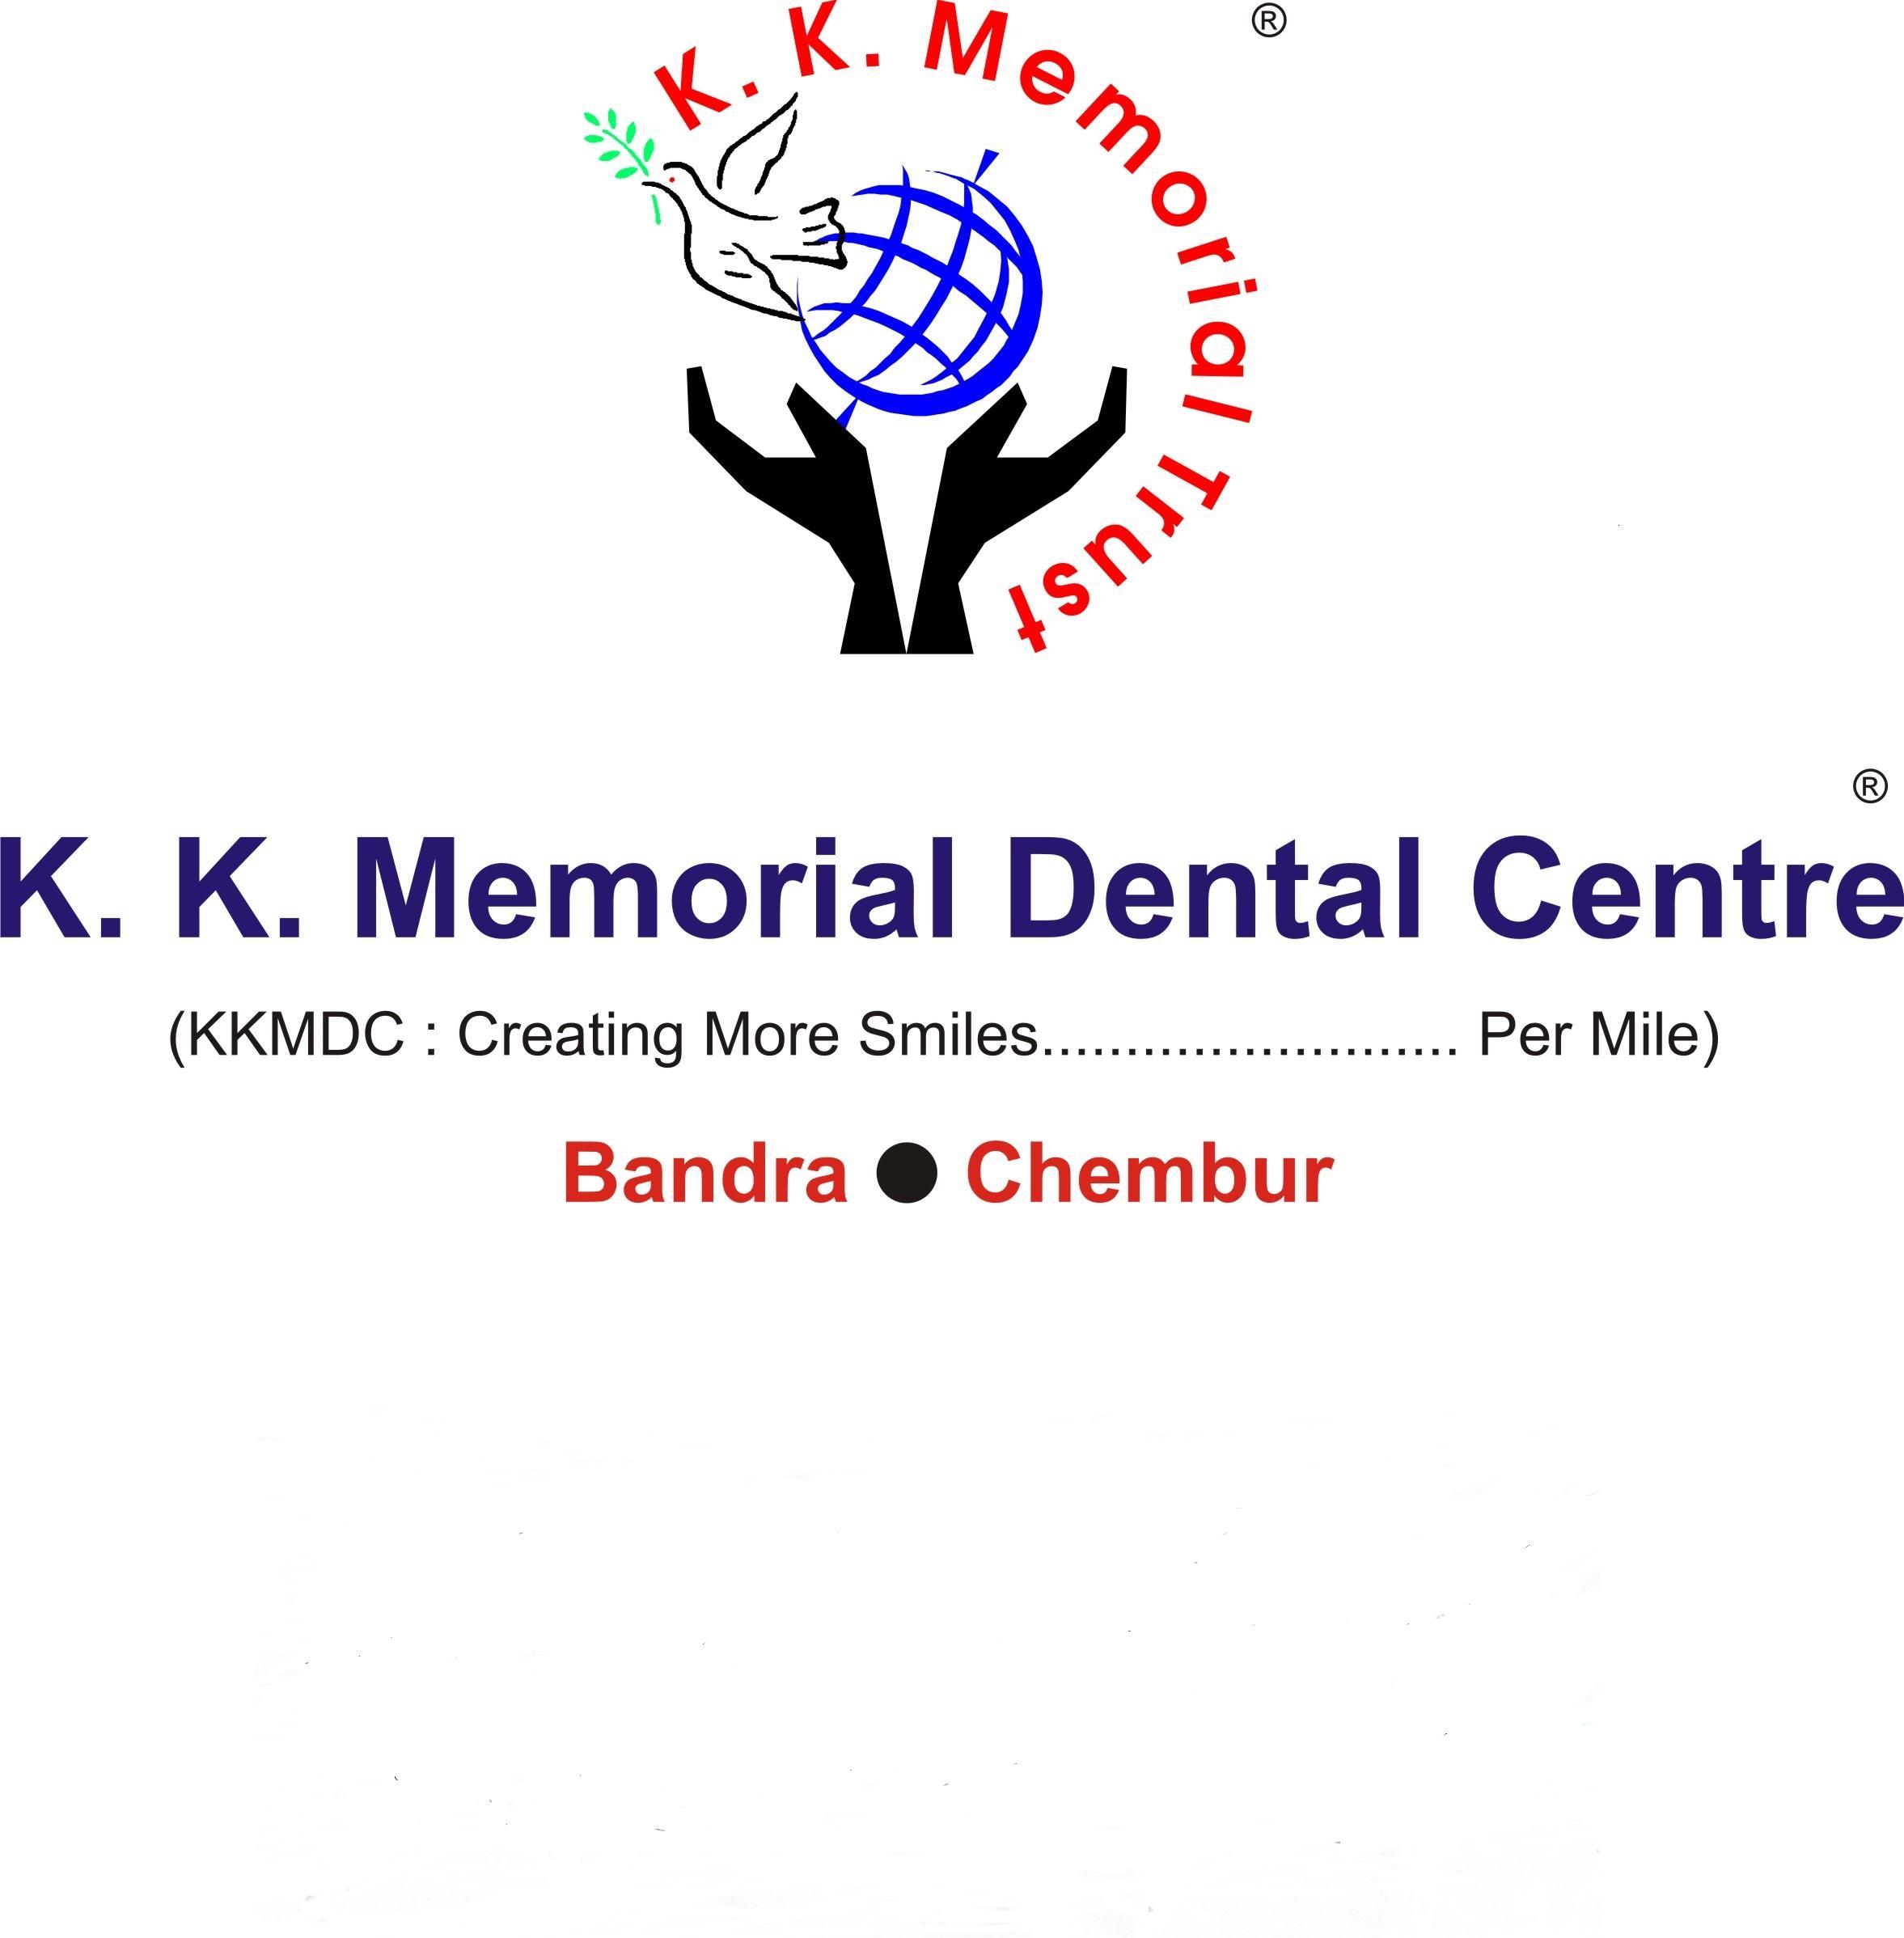 K.K Memorial Dental Centre